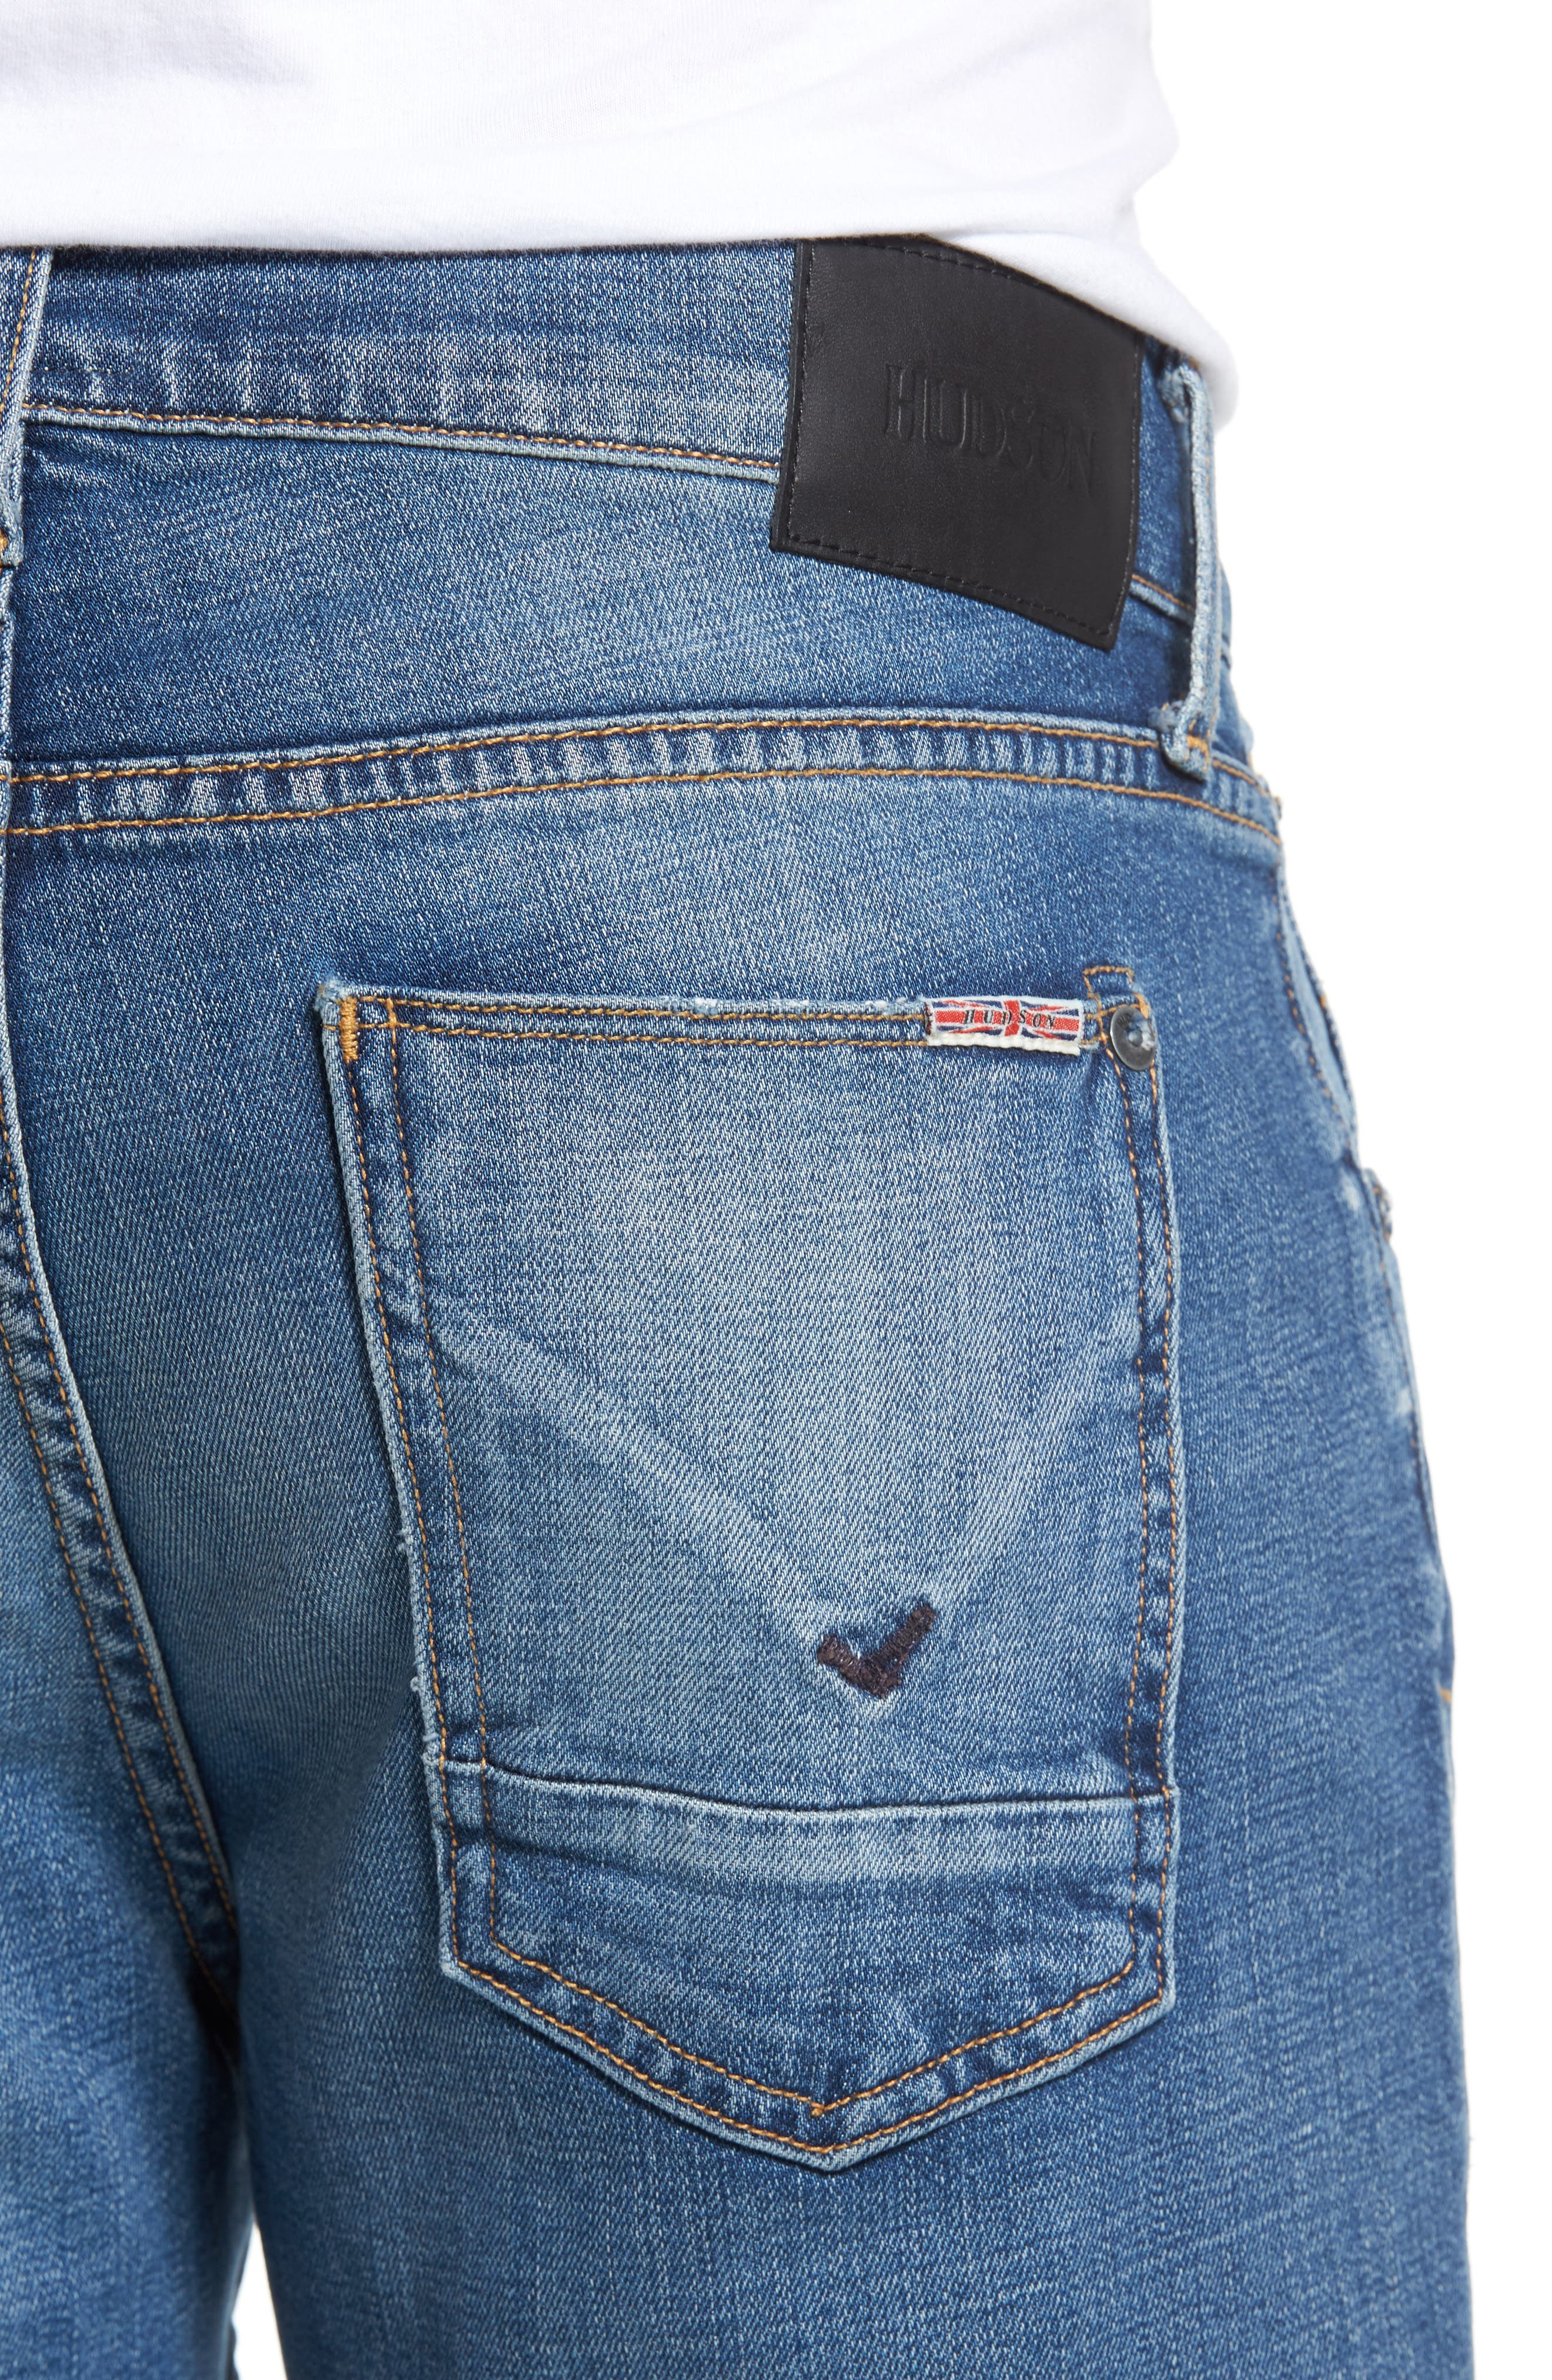 Blake Slim Fit Jeans,                             Alternate thumbnail 4, color,                             453